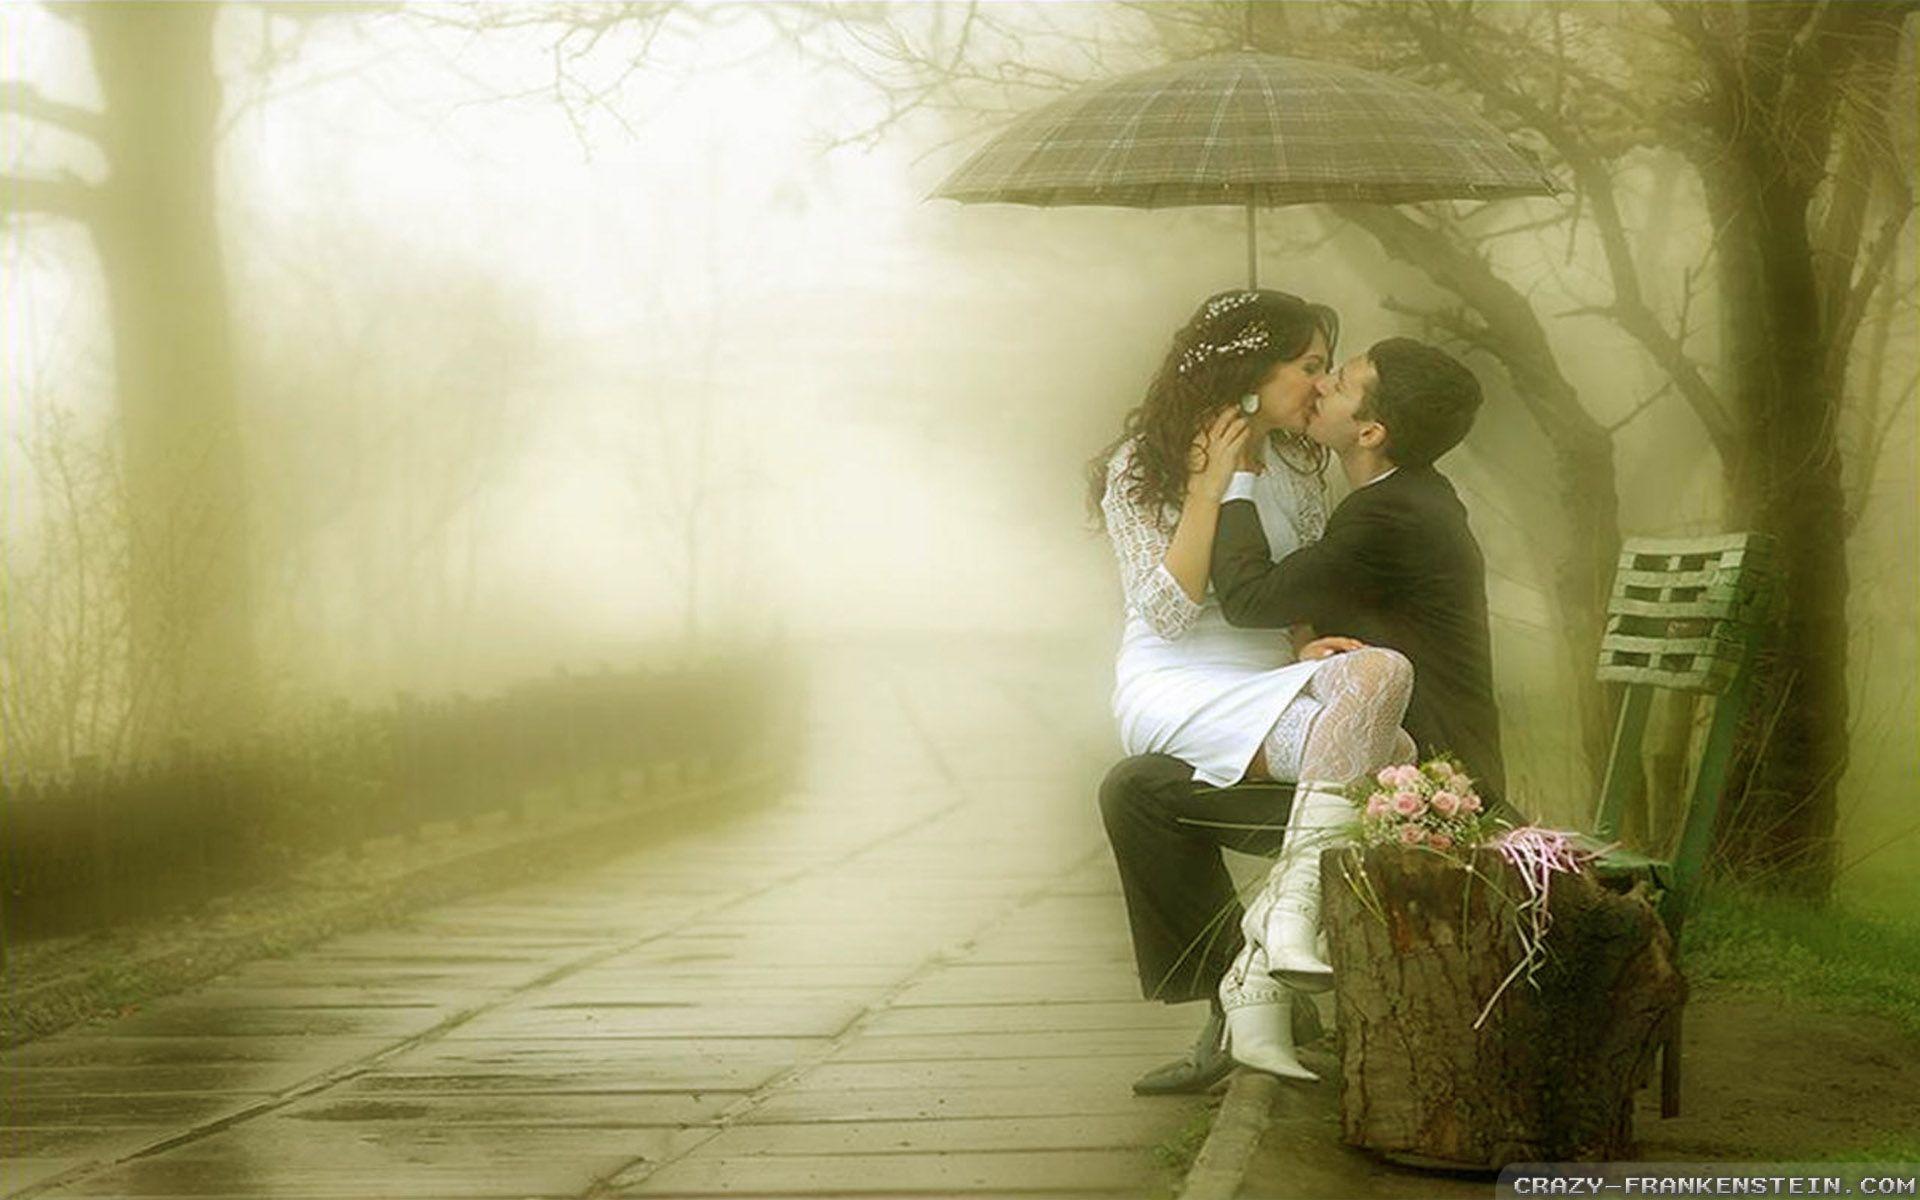 Best Amazing Beautiful Cute Romantic Love Couple Hd Wallpapers Romantik Romantische Paarchen Romantische Bilder